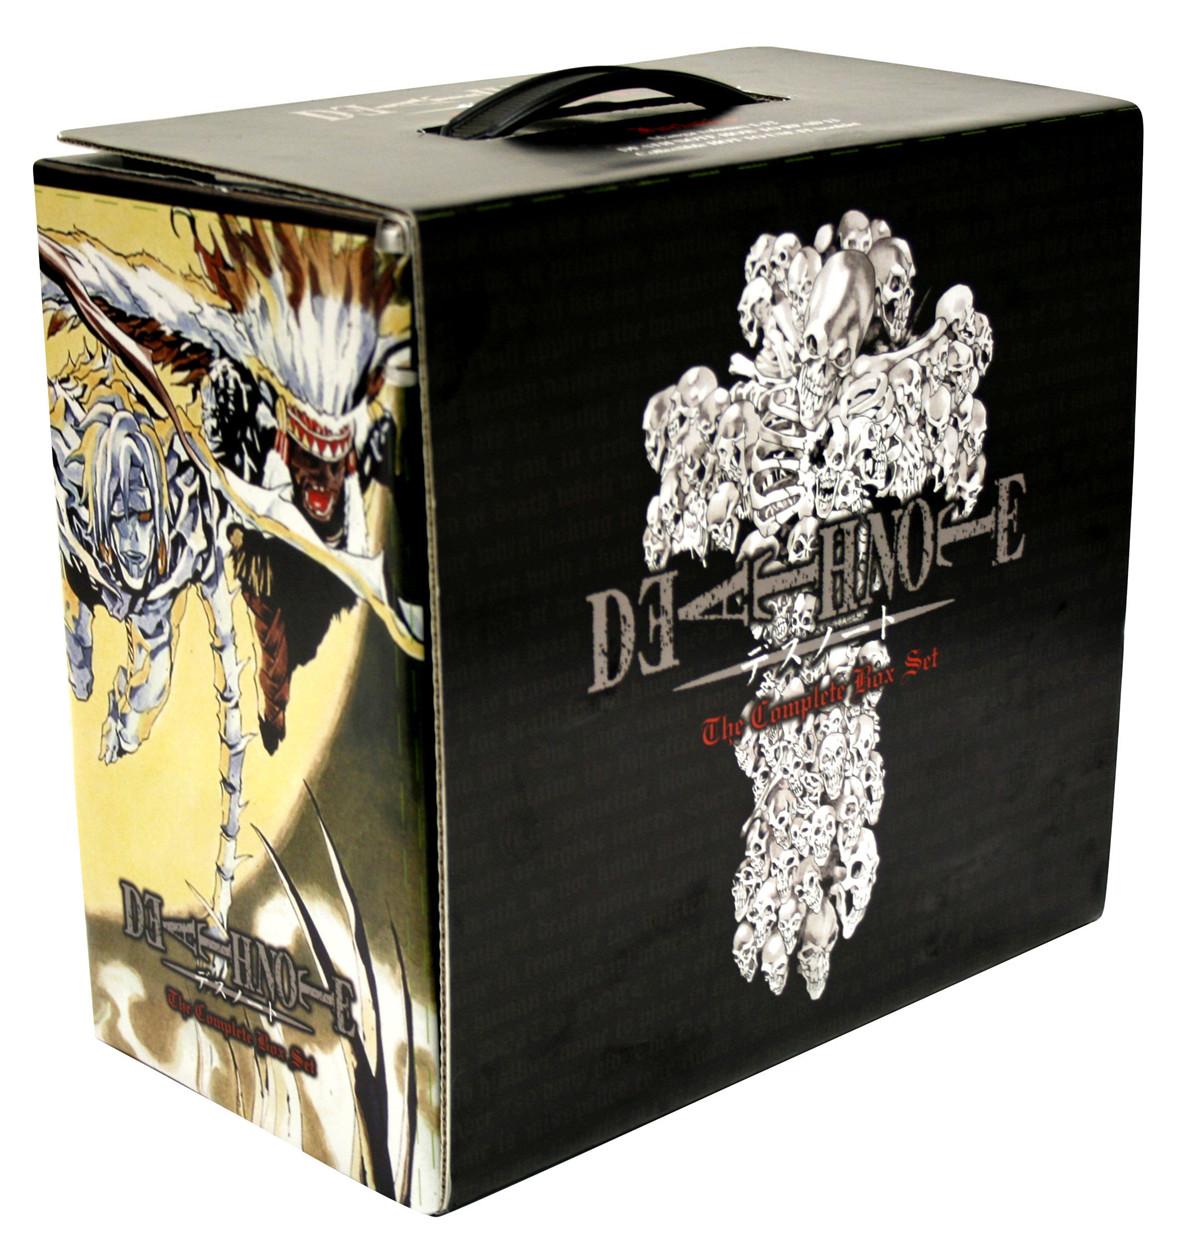 Death note box set (vol s 1 13) 9781421525815.in01